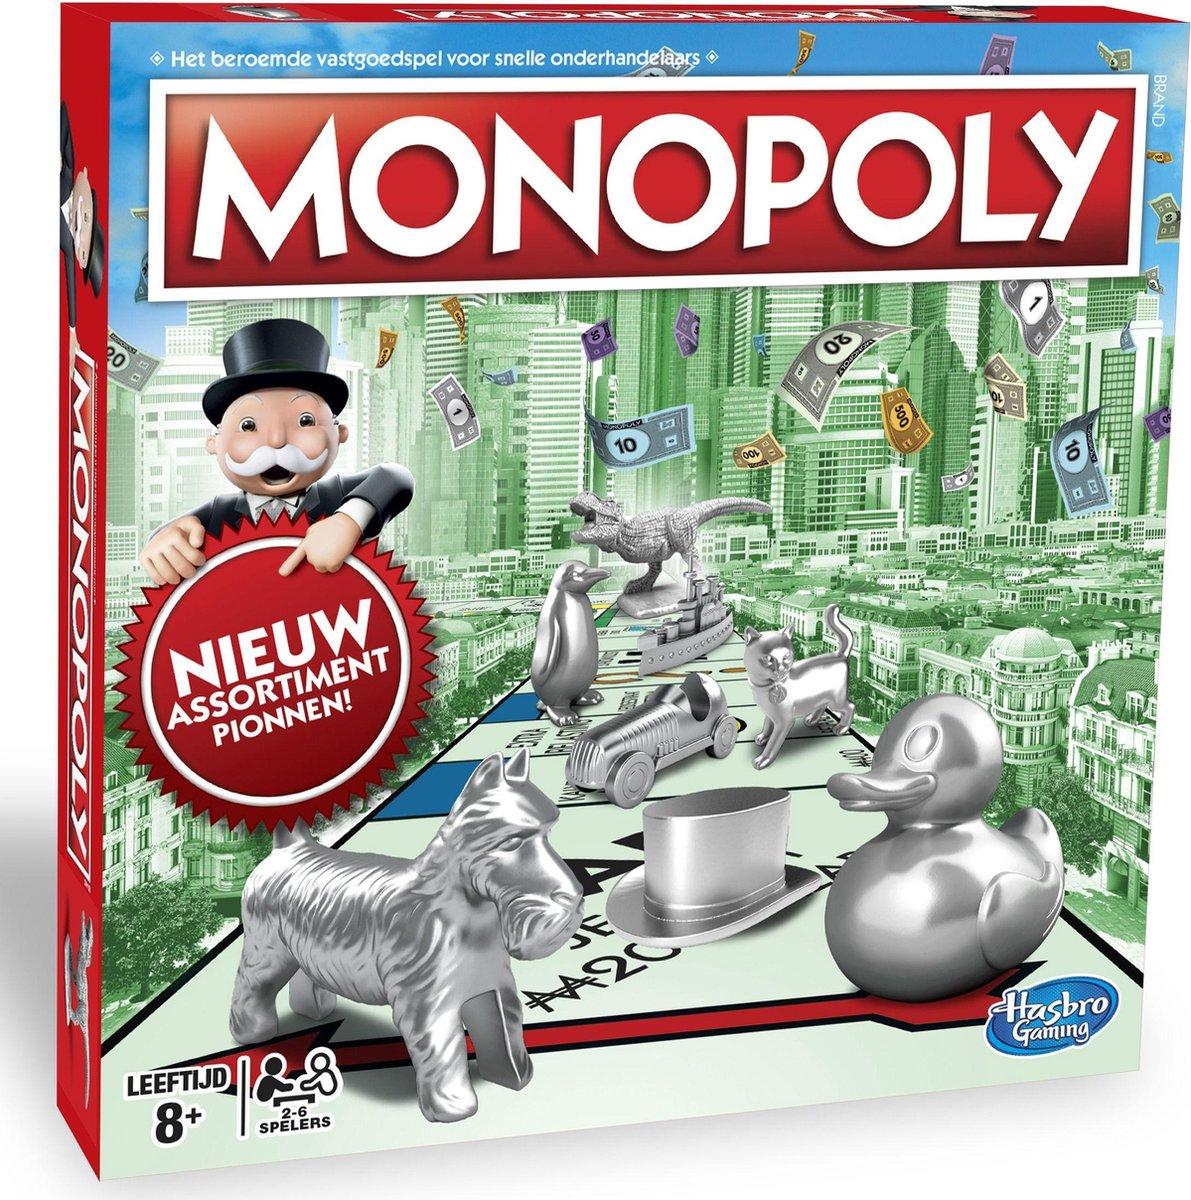 Monopoly Classic Nederland - Bordspel - Monopoly